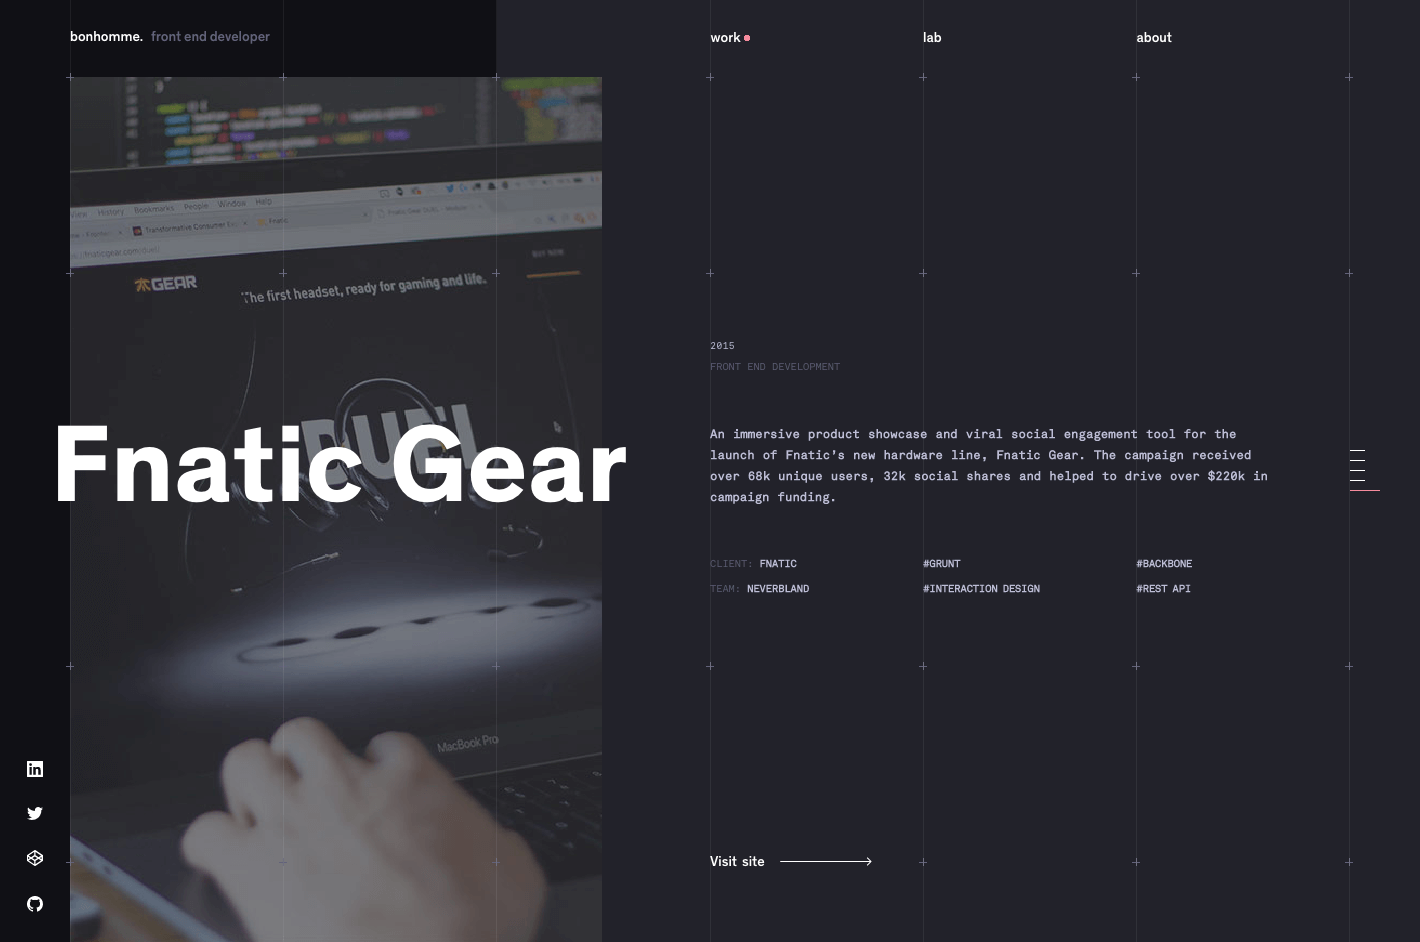 web designer portfolios bonhomme